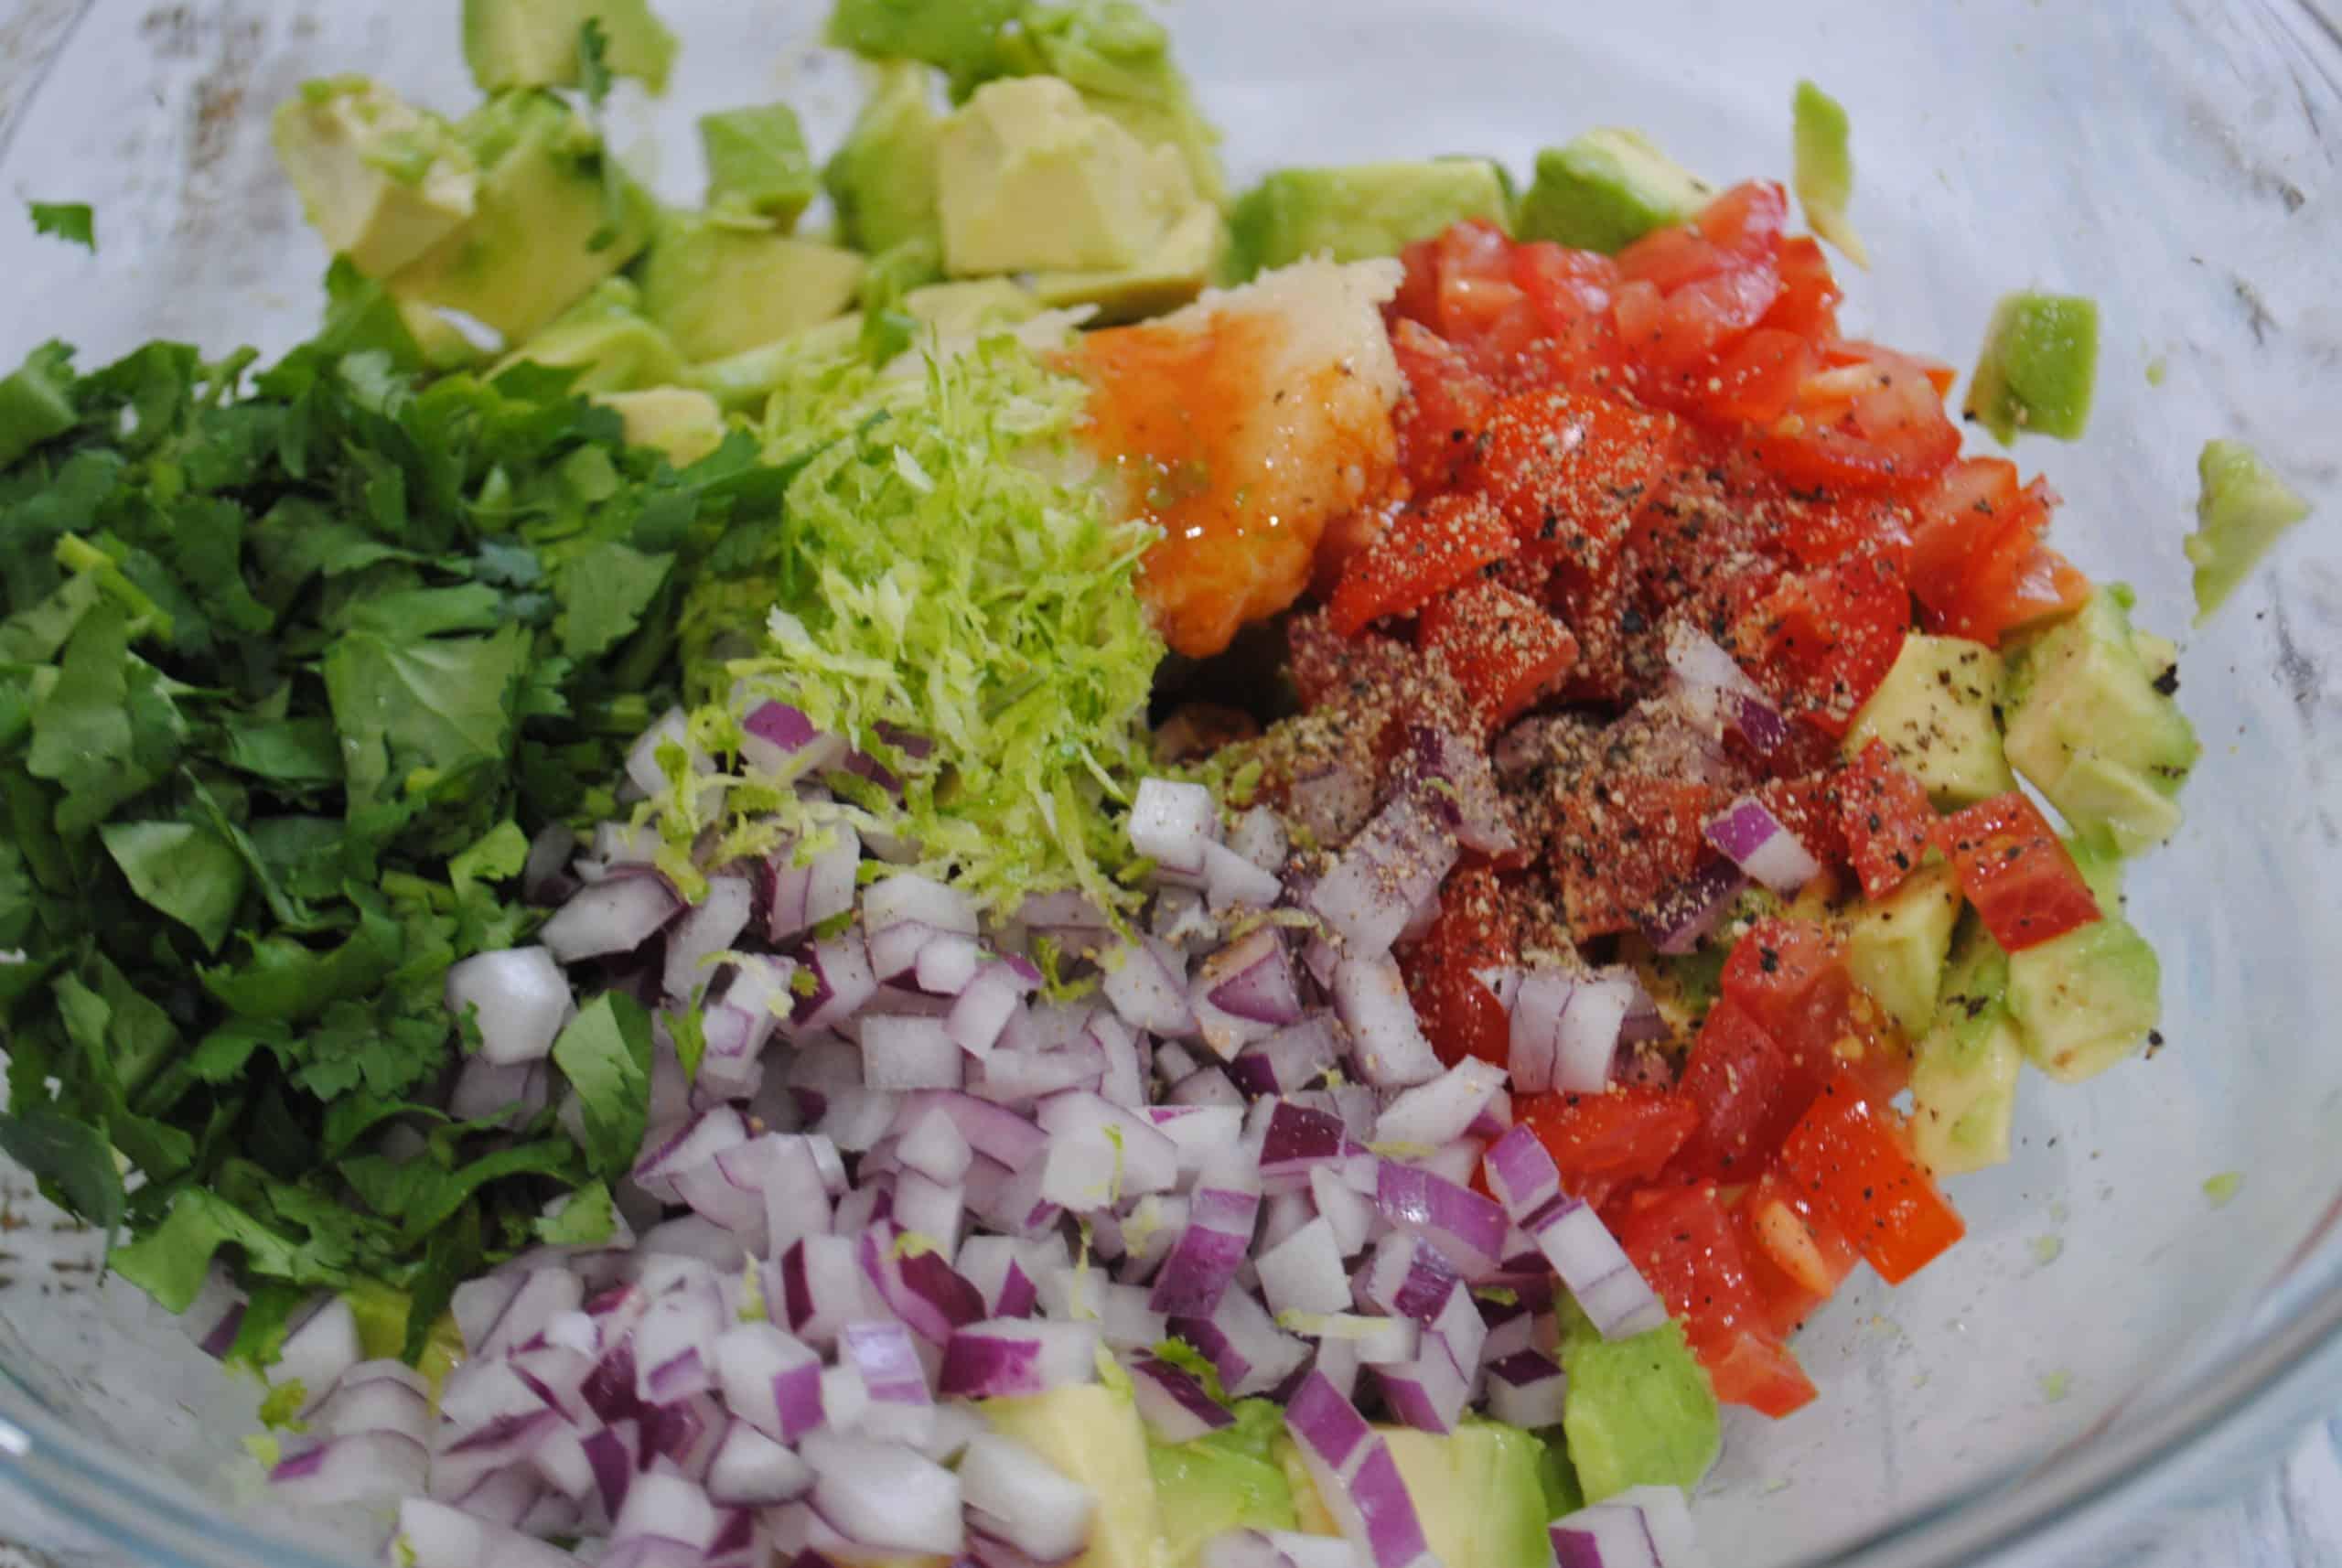 guacamole preparation with onion, tomato, coriander, garlic, lime zest, tabasco added to bowl ready to mix through